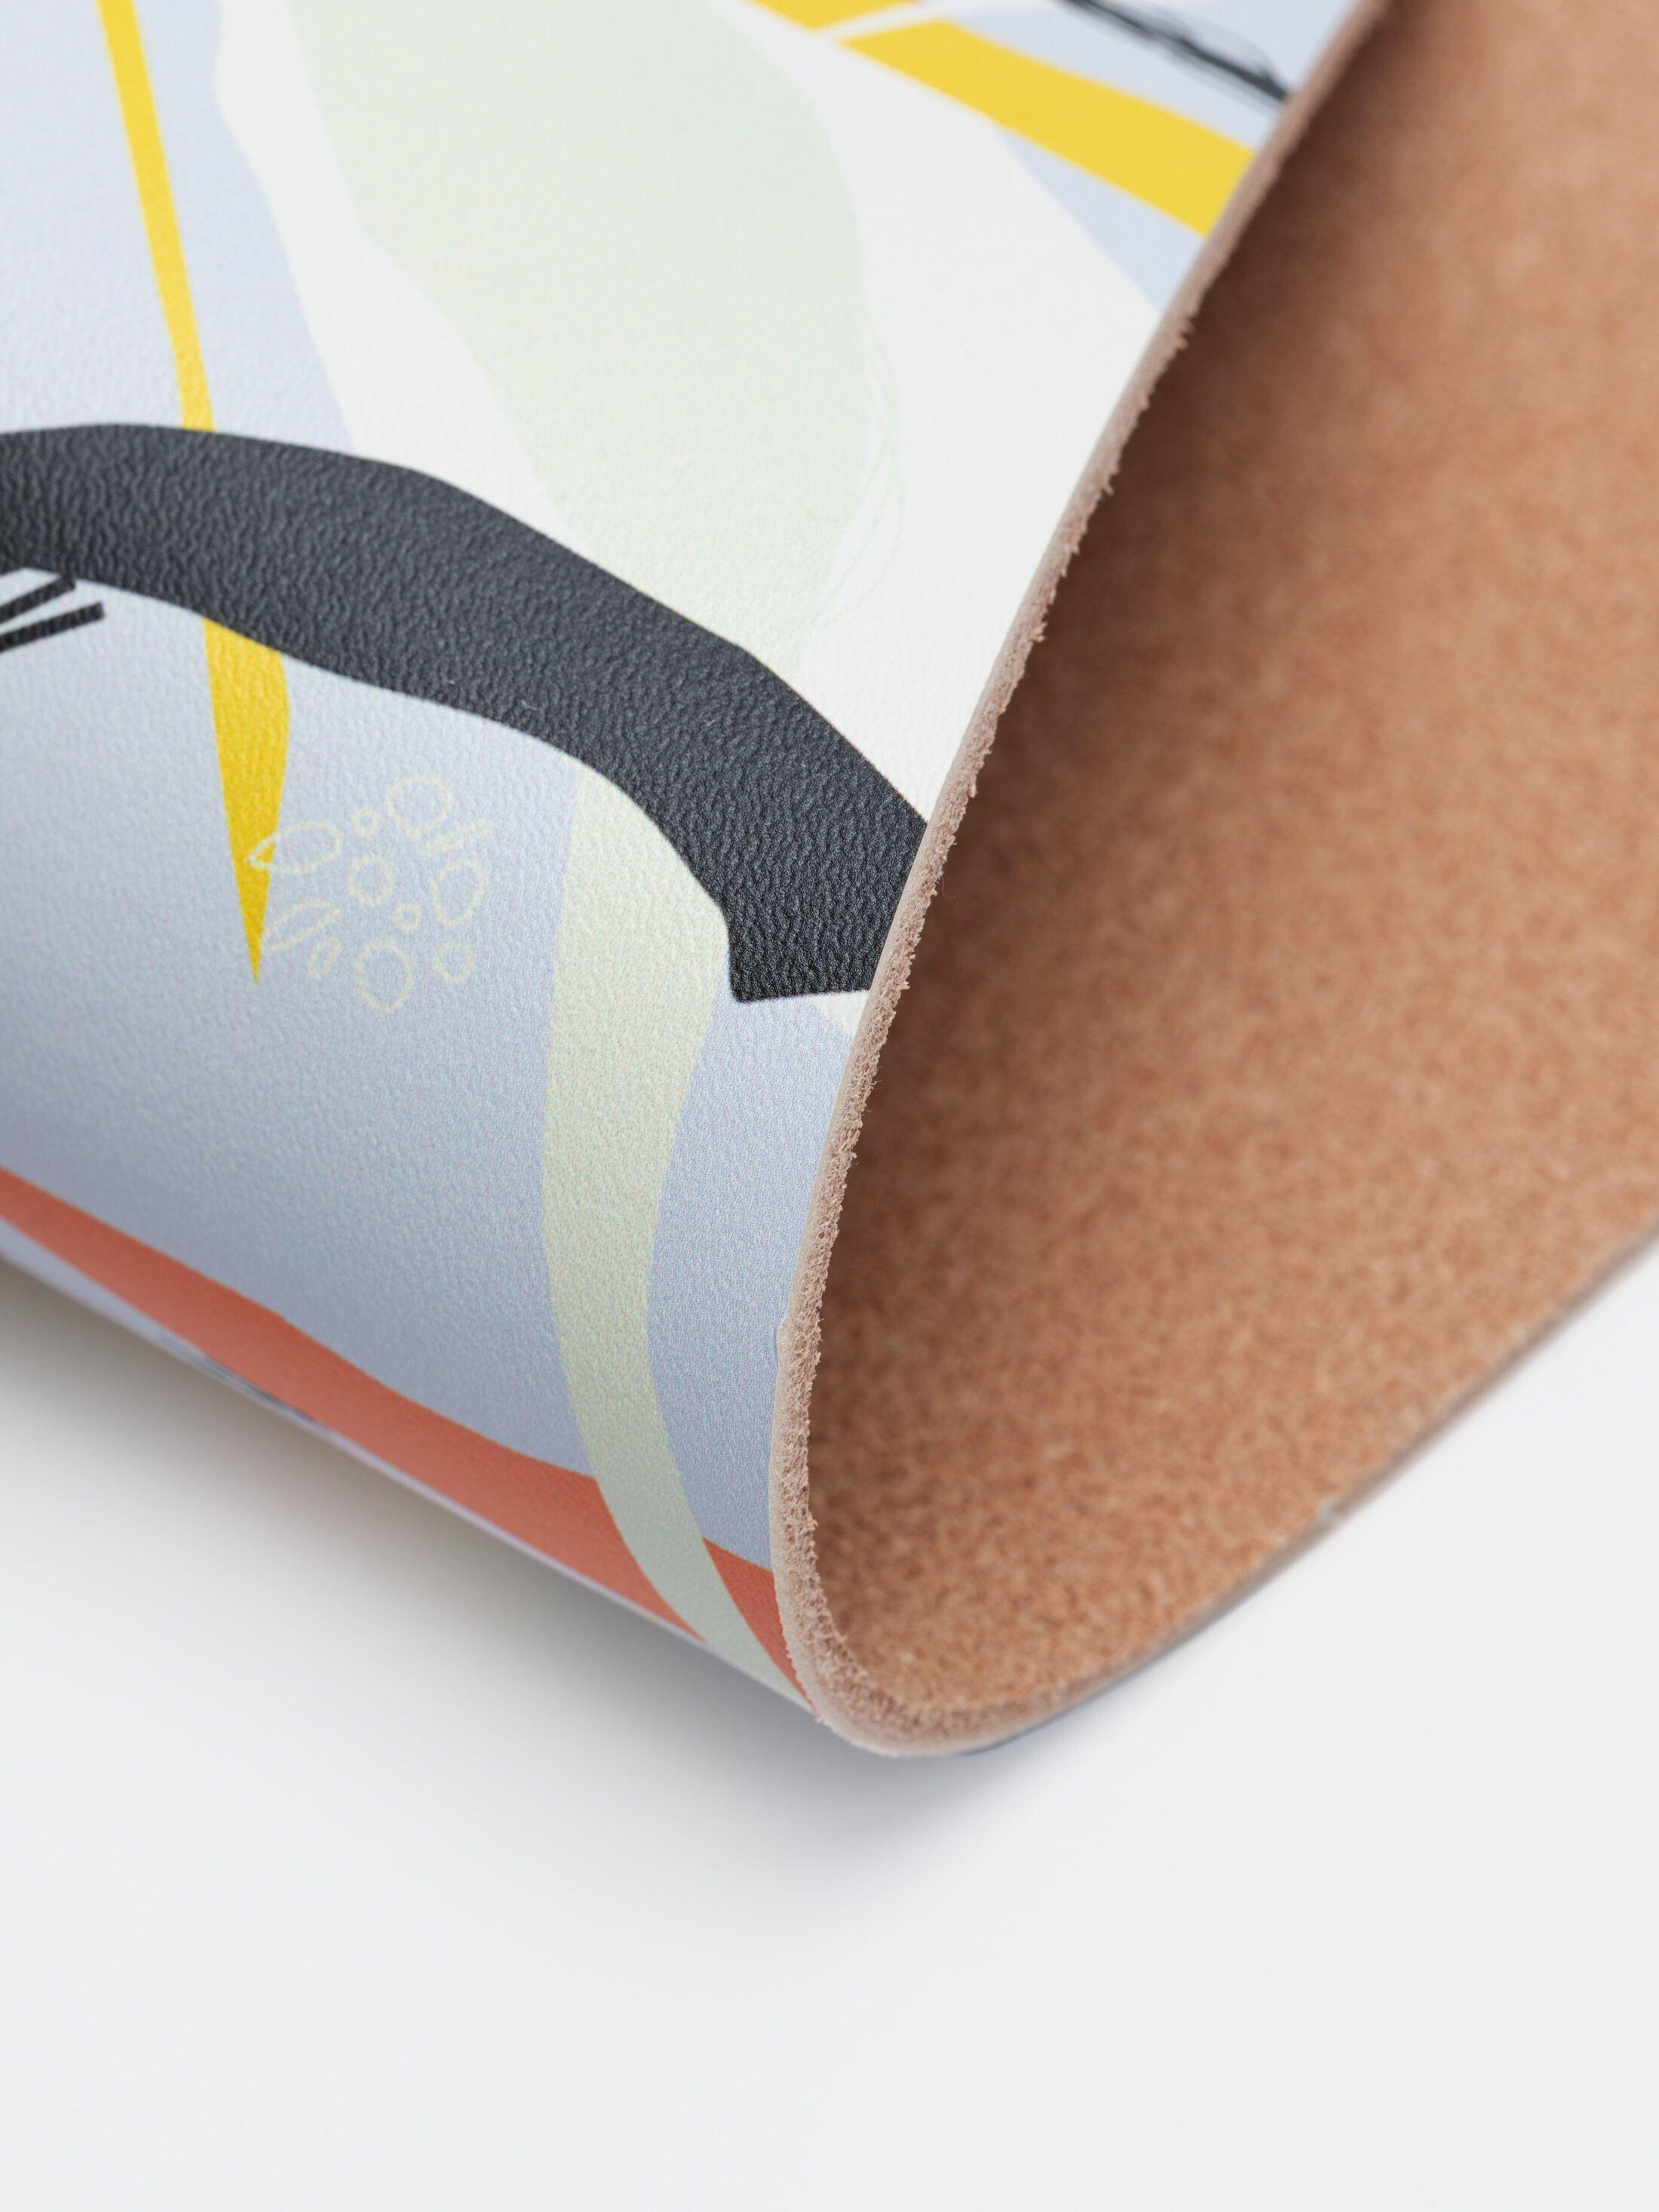 design your own full grain leather